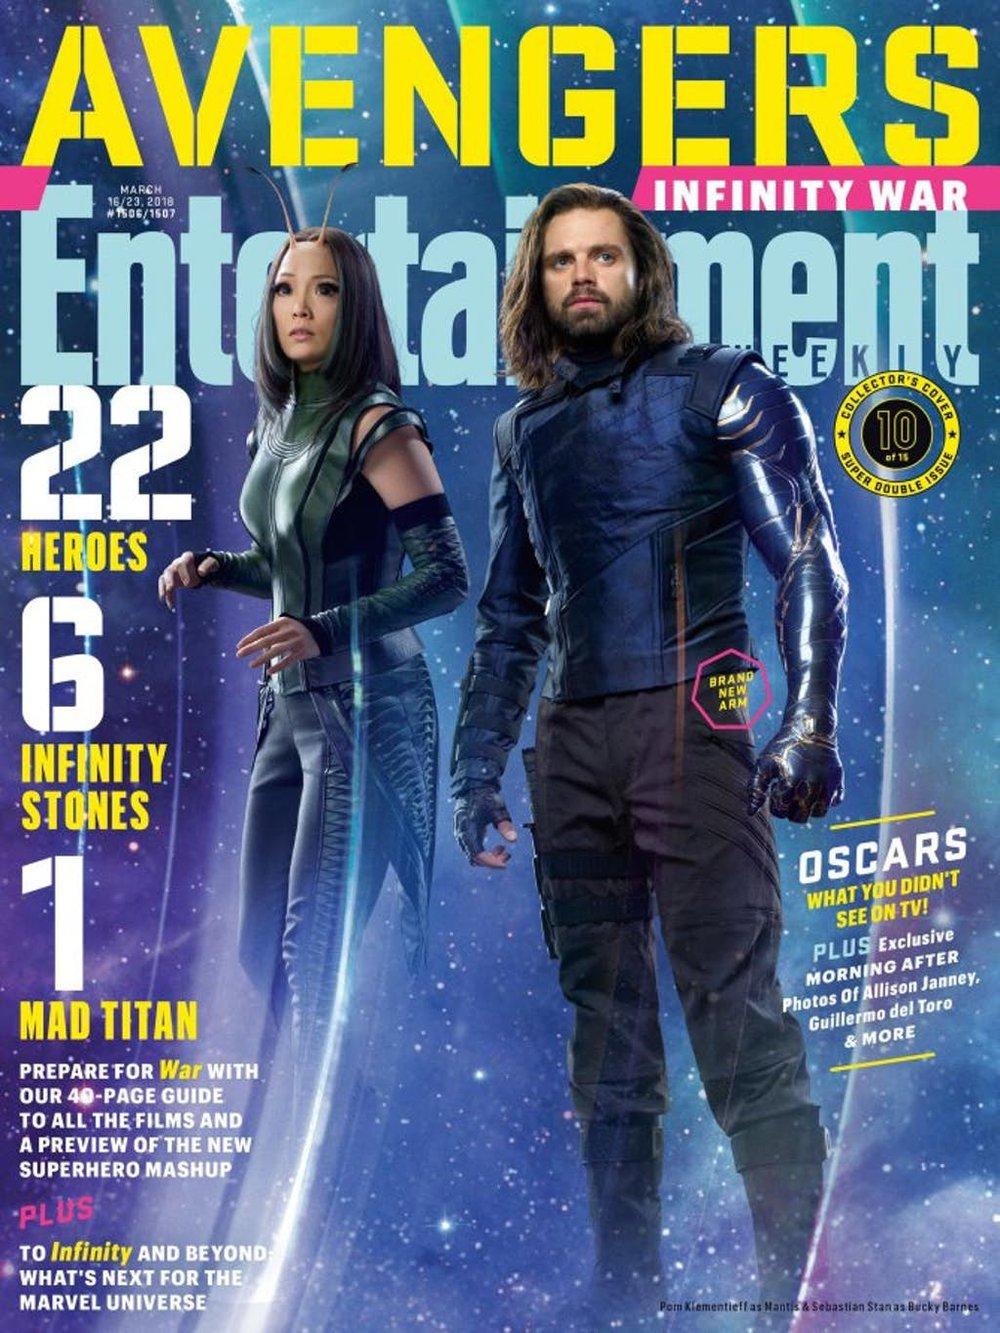 Mantis-Bucky-EW-cover.jpg